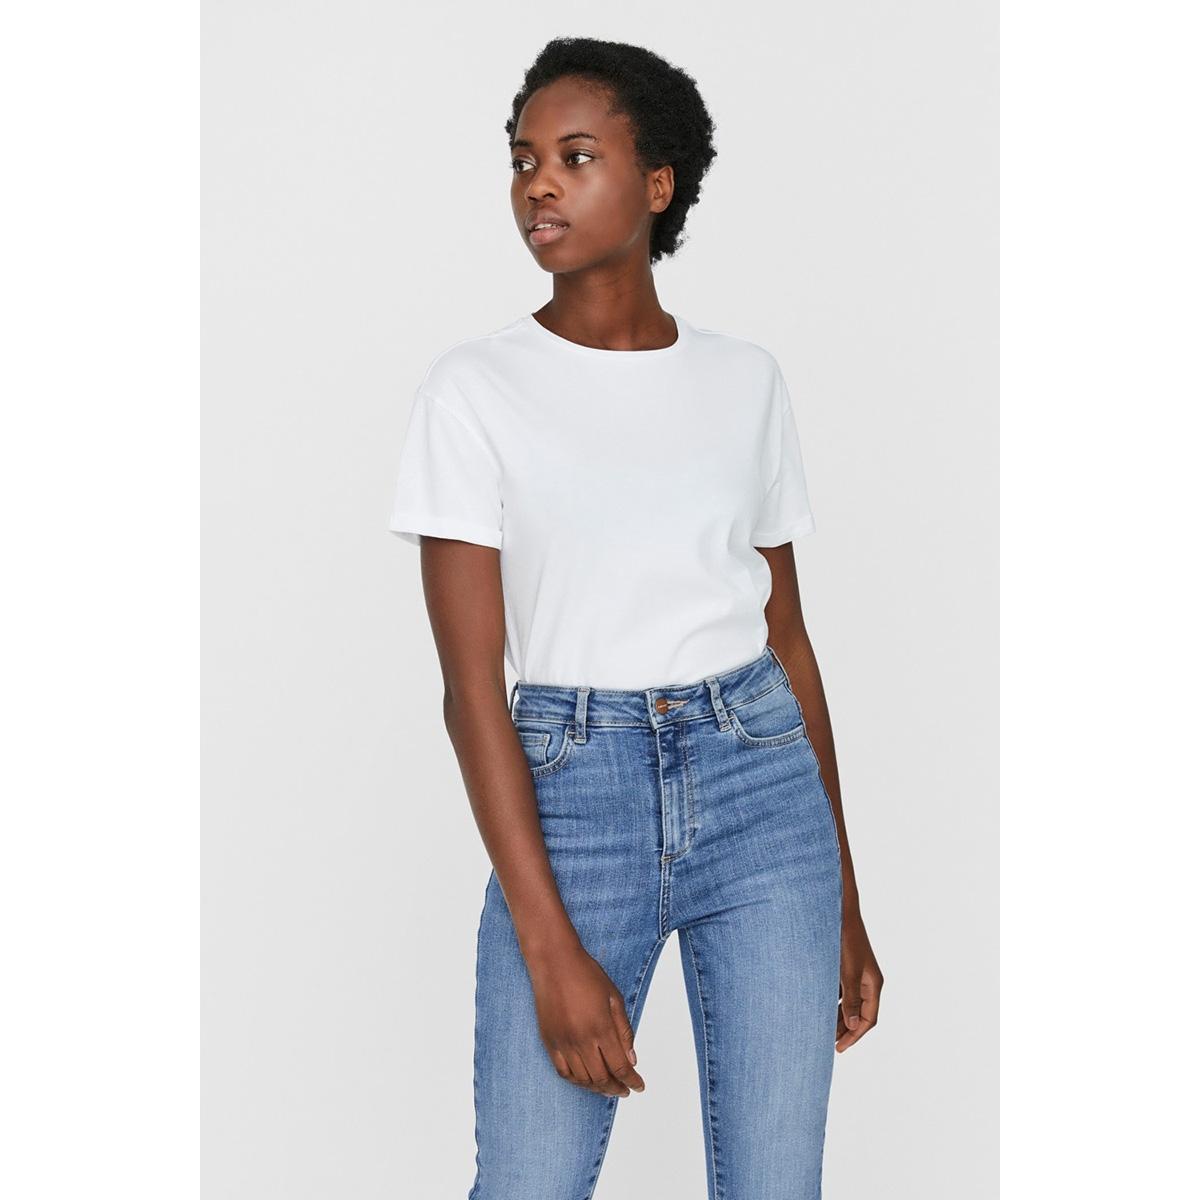 nmbrandy s/s top bg noos 27010978 noisy may t-shirt bright white